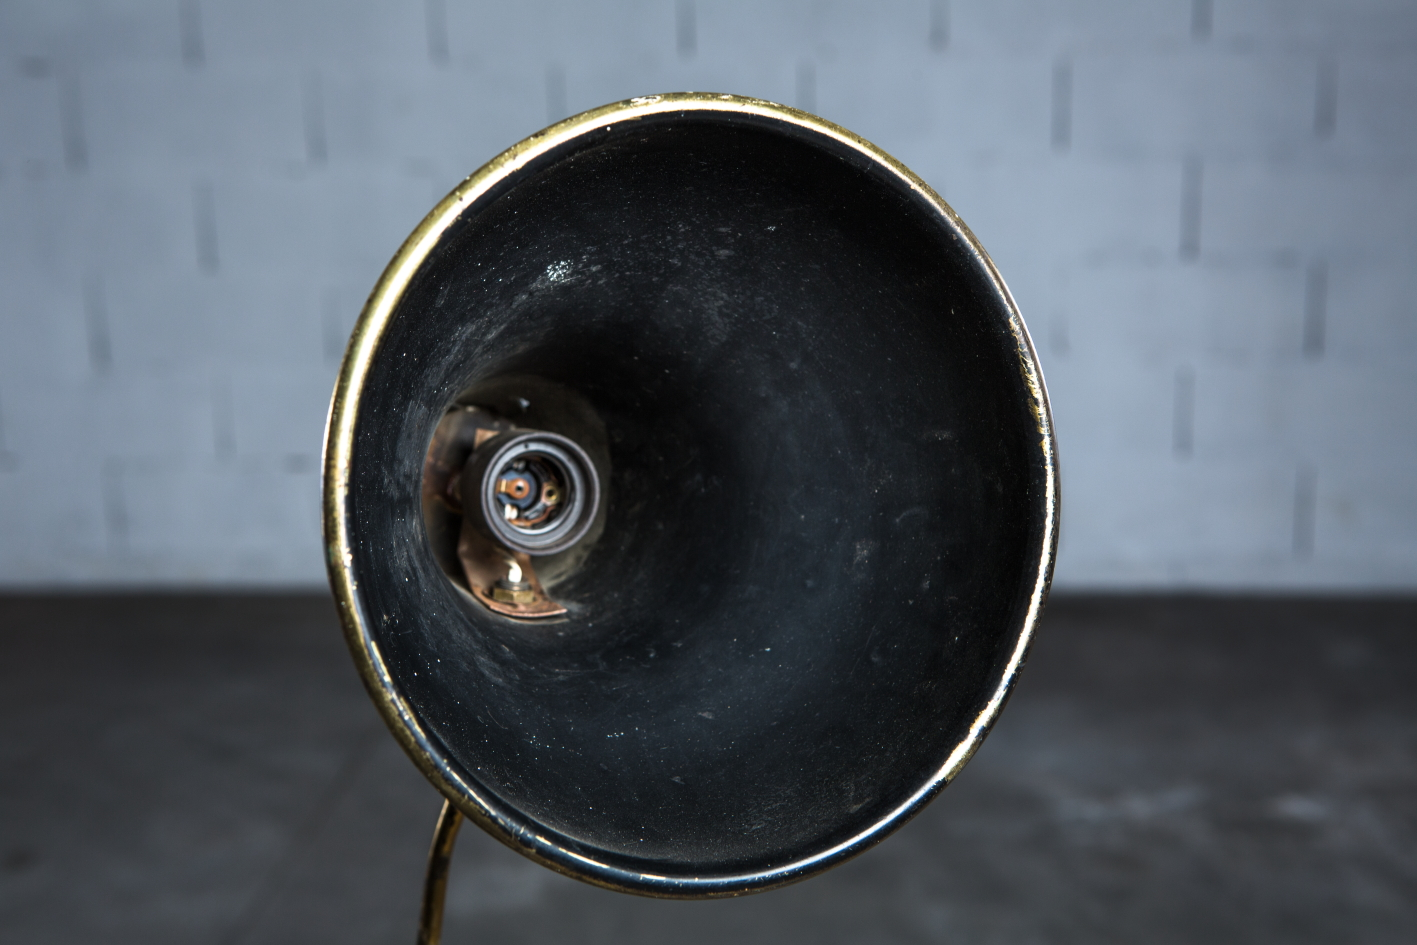 Brass 1950s Italian extendable floor lamp - Front view